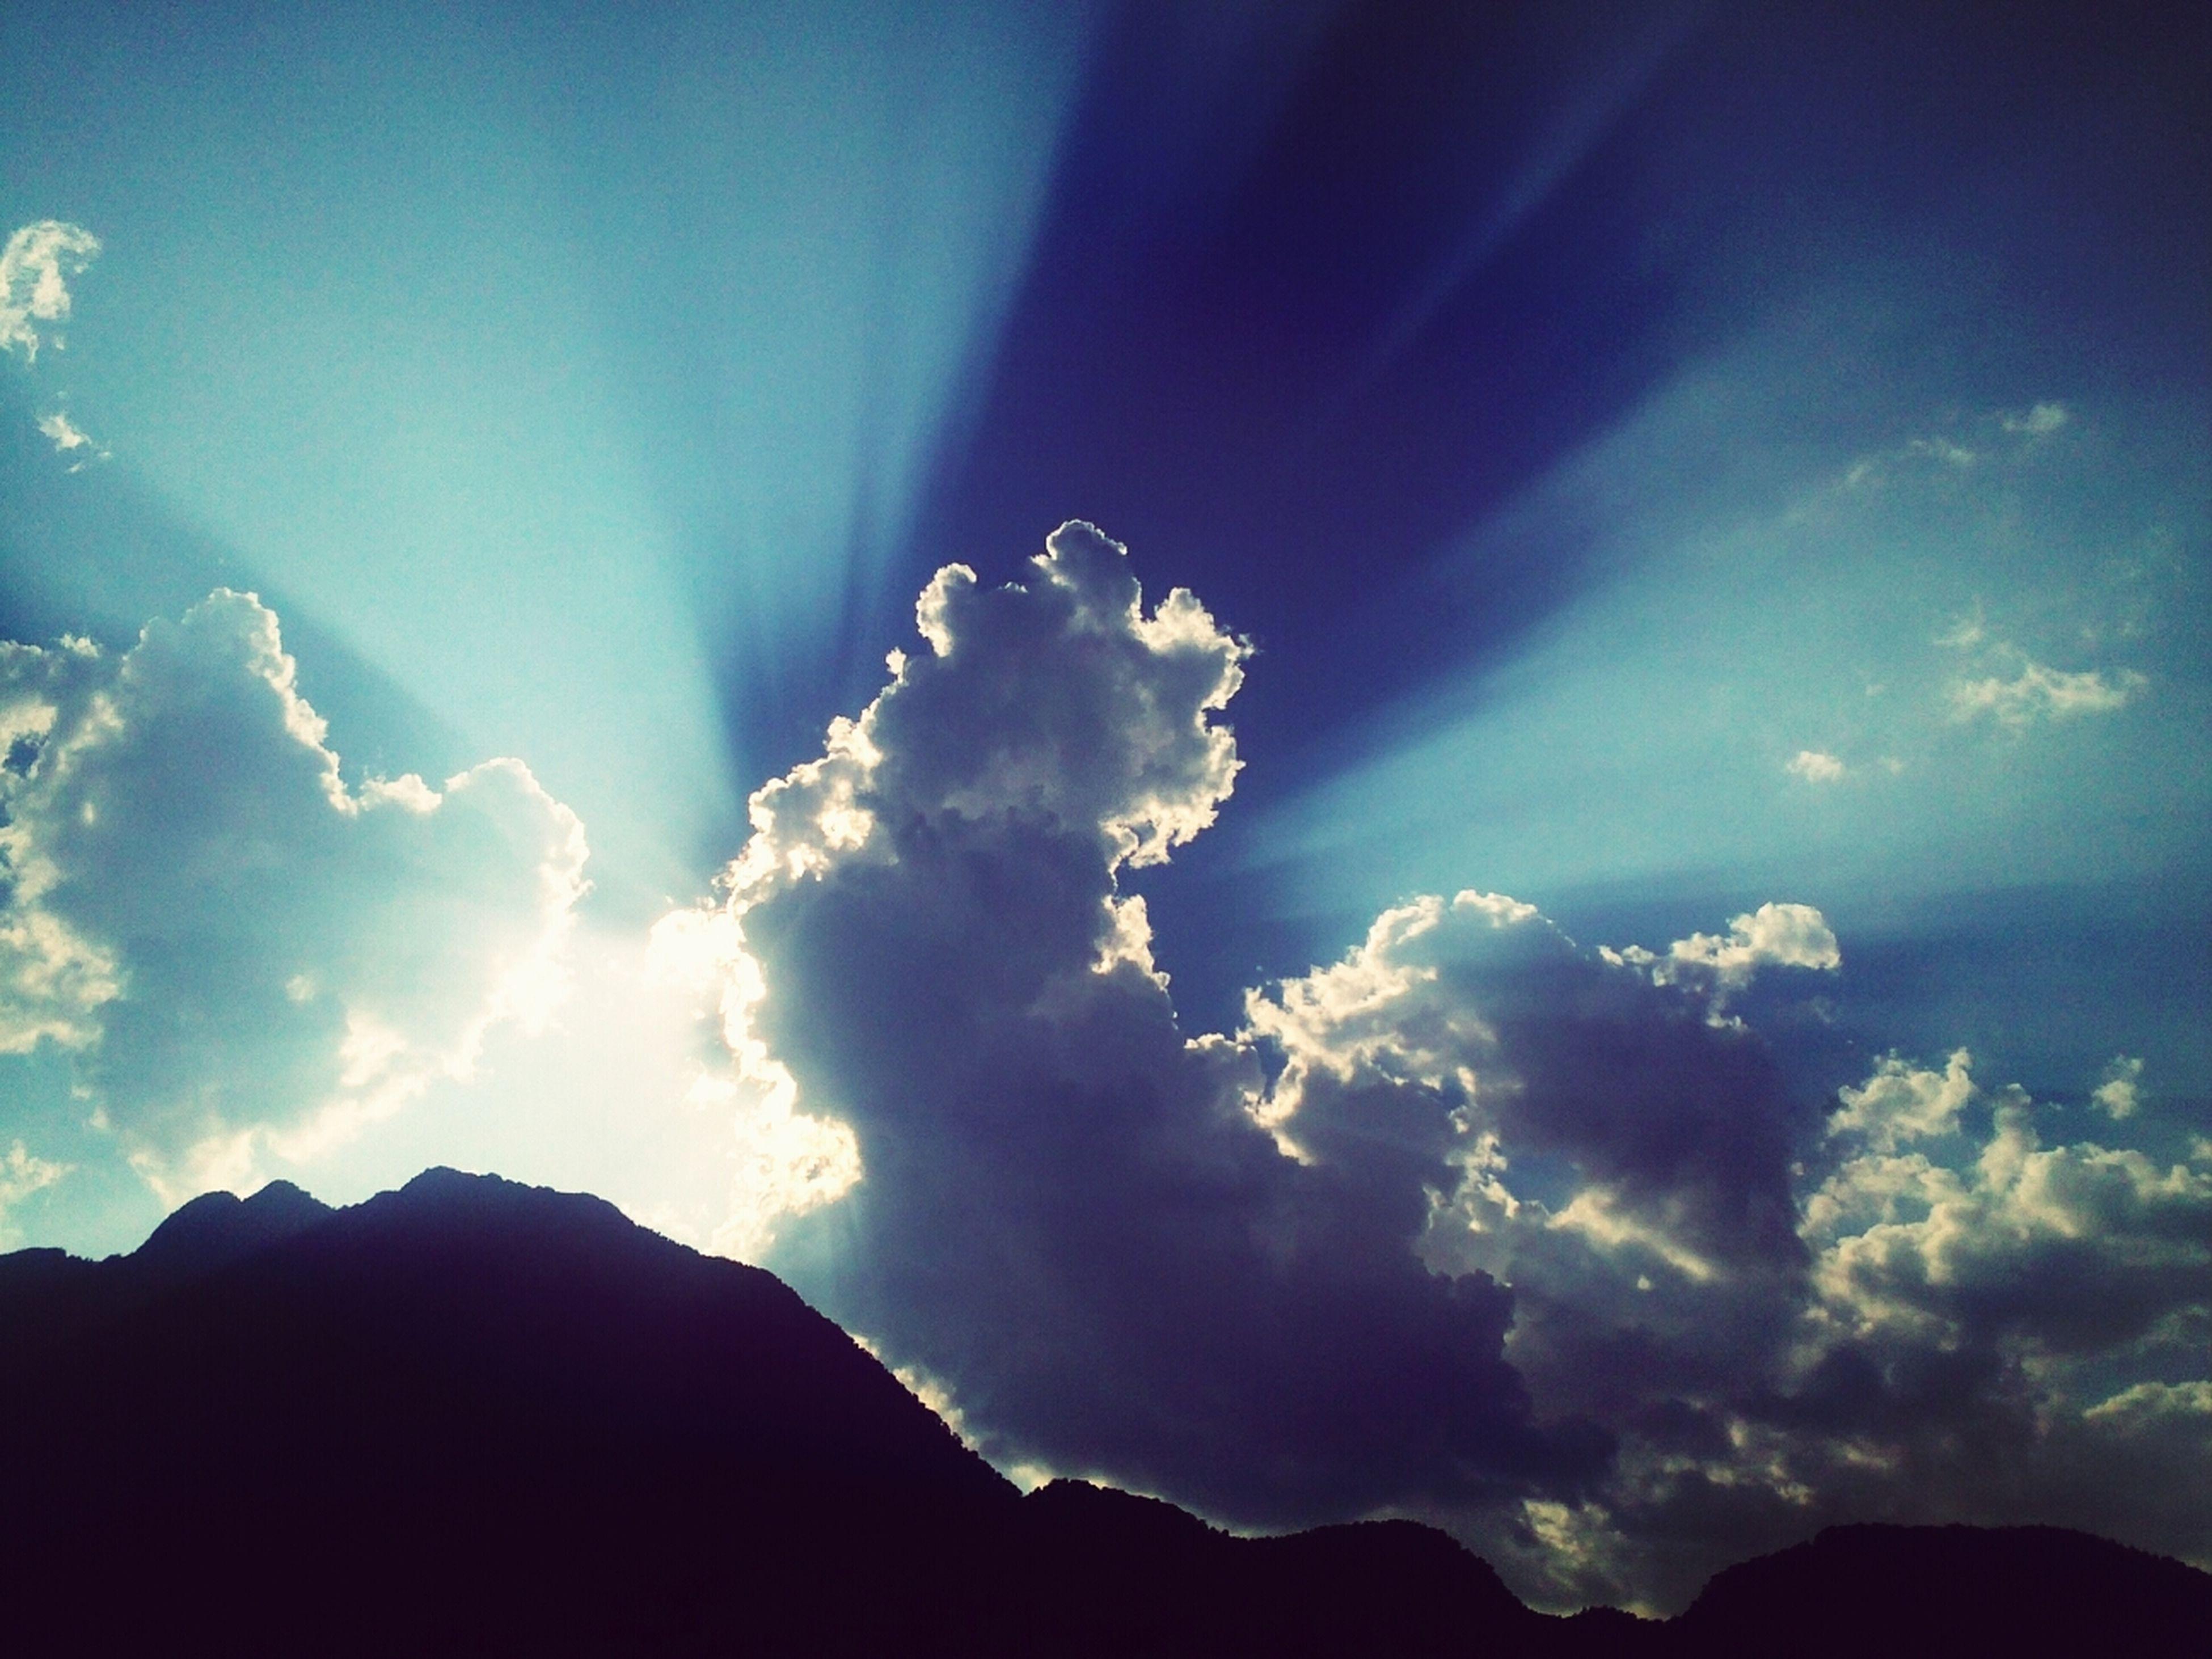 Turkey Kemergoynuk Sky And Clouds